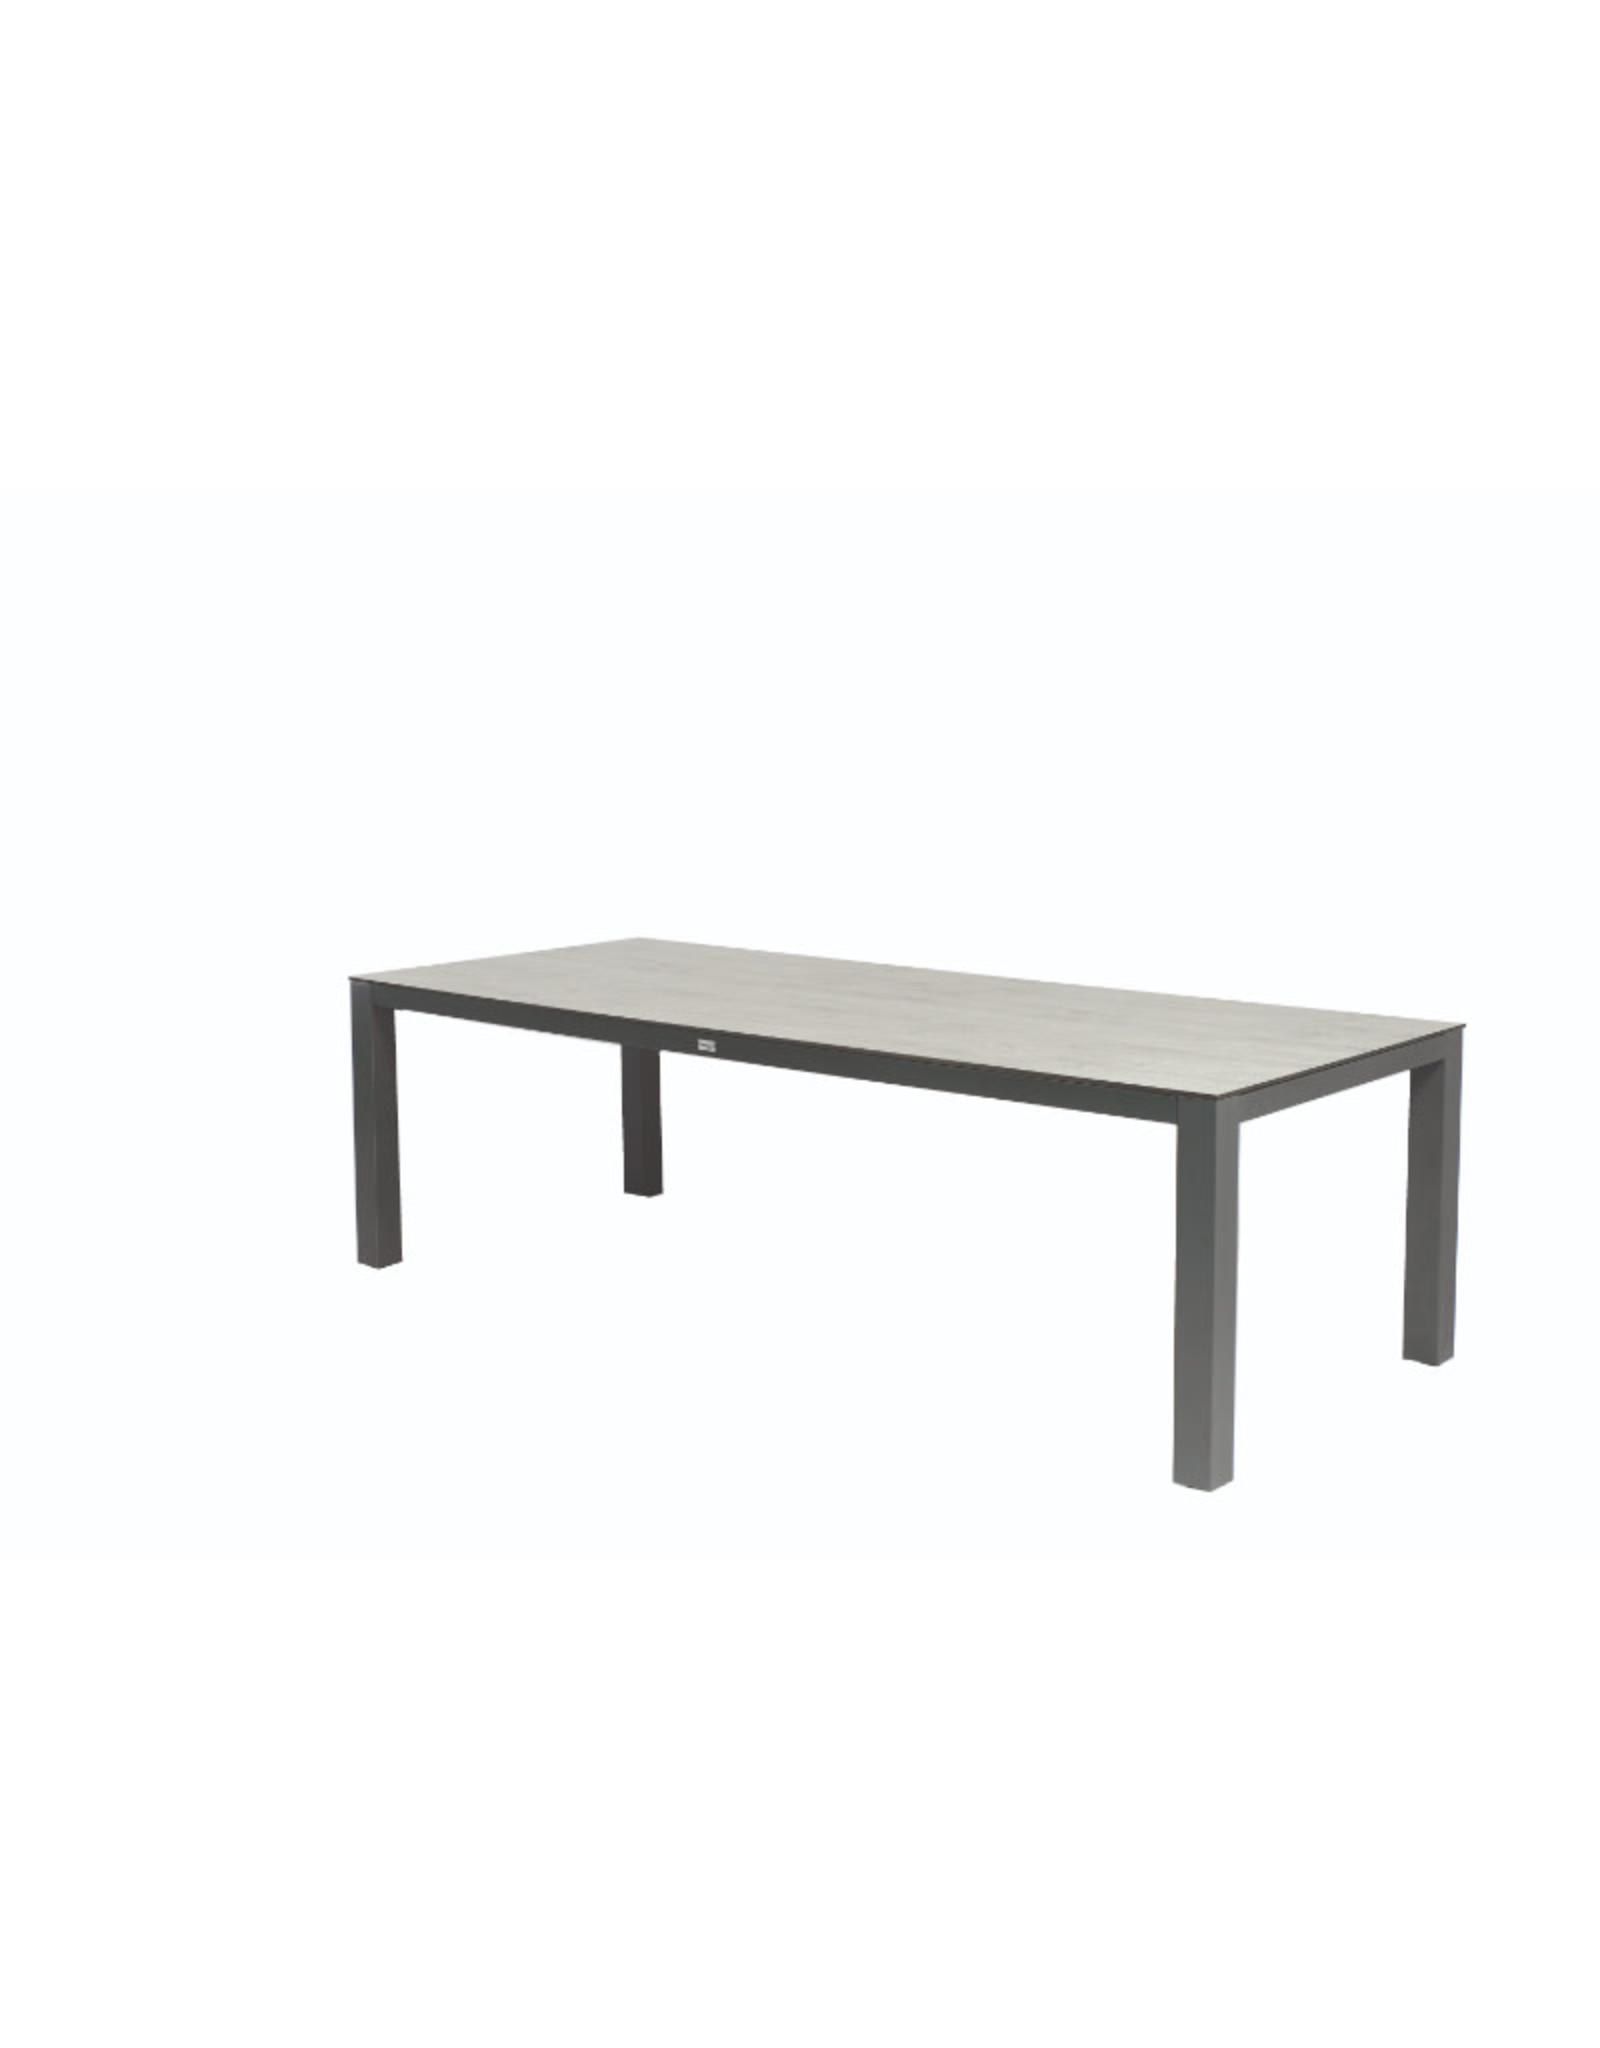 Tierra Outdoor Tierra Outdoor Briga Table Trespa Oak Grey 220x100cm Charcoal Frame